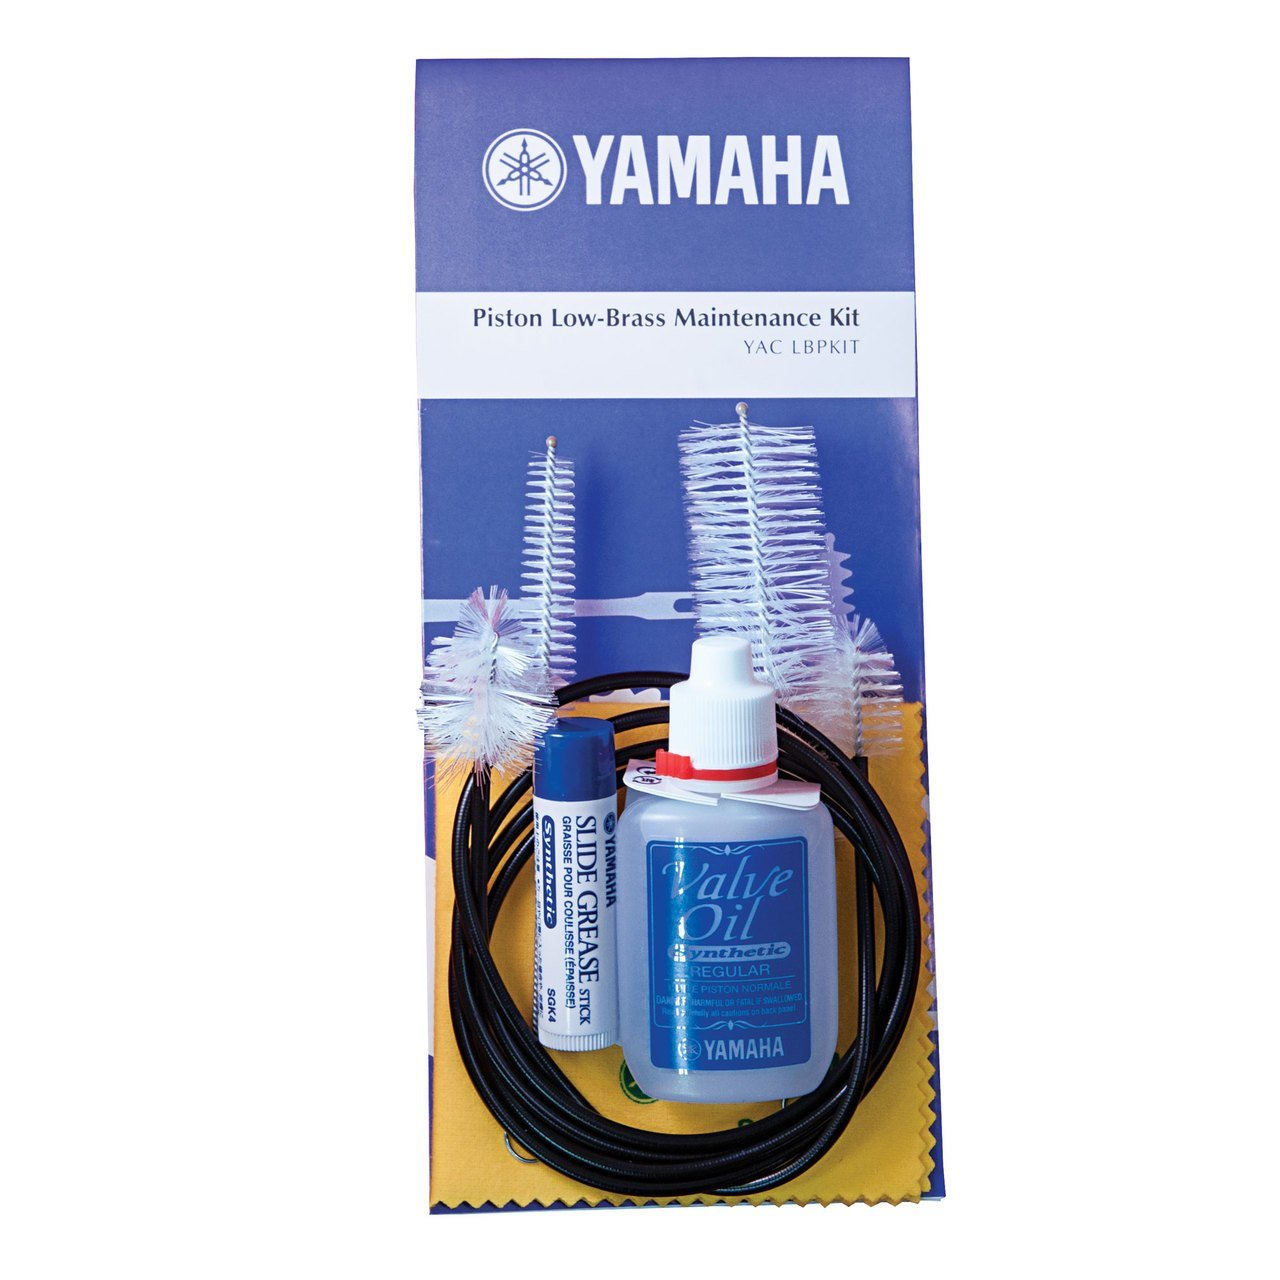 Yamaha Piston Low Brass Maintenance Kit